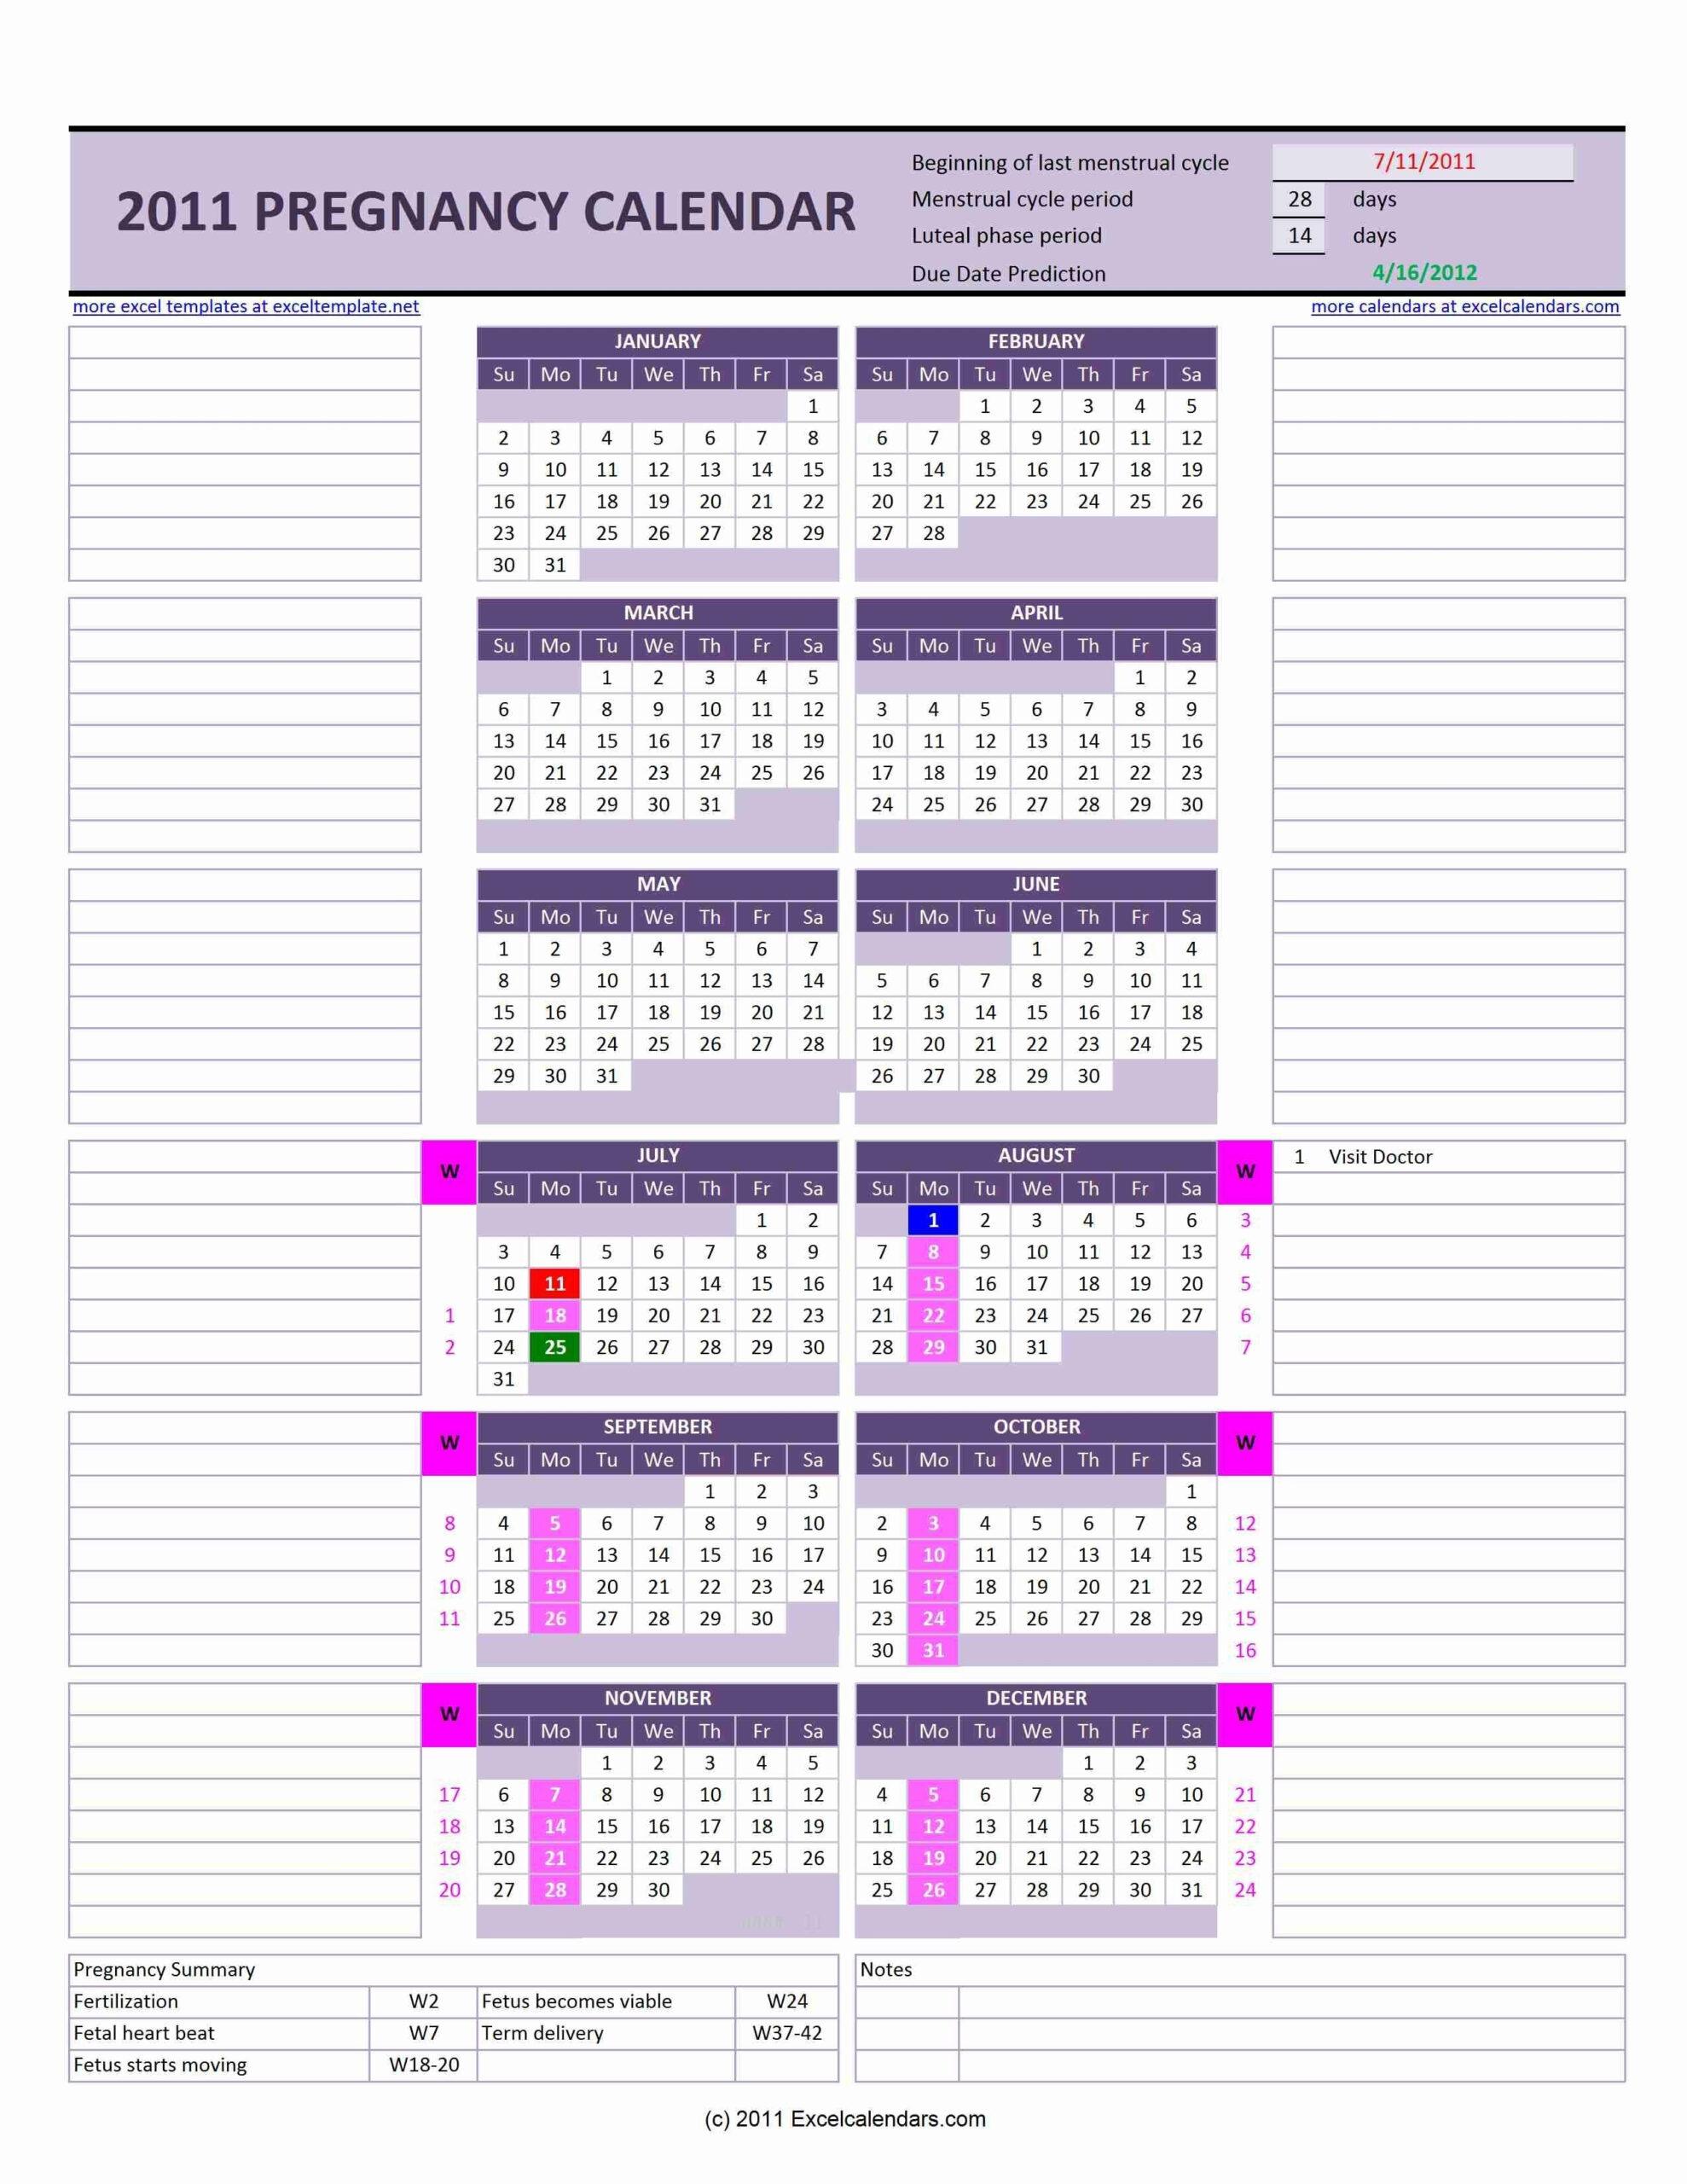 Chiense Ovulation Calander. for Babycenter Gender Calendar